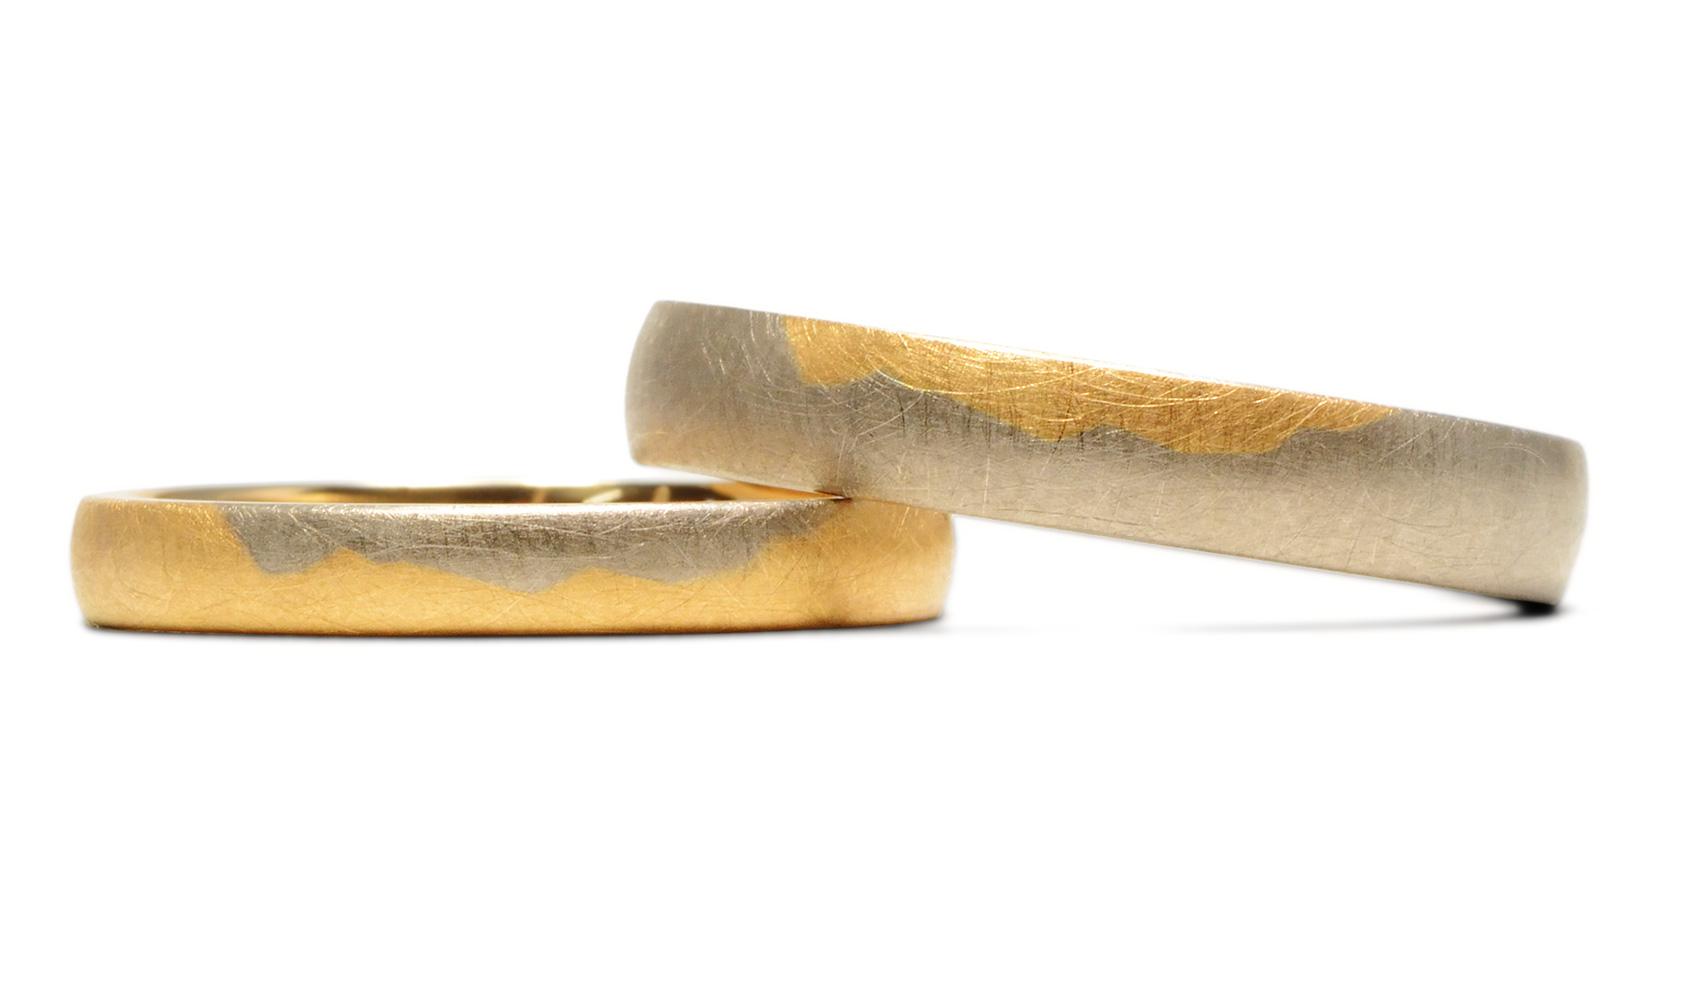 GOLDAFFAIRS - Zweifarbige Trauringe mal anders - Ringe aus Fair Trade Gold